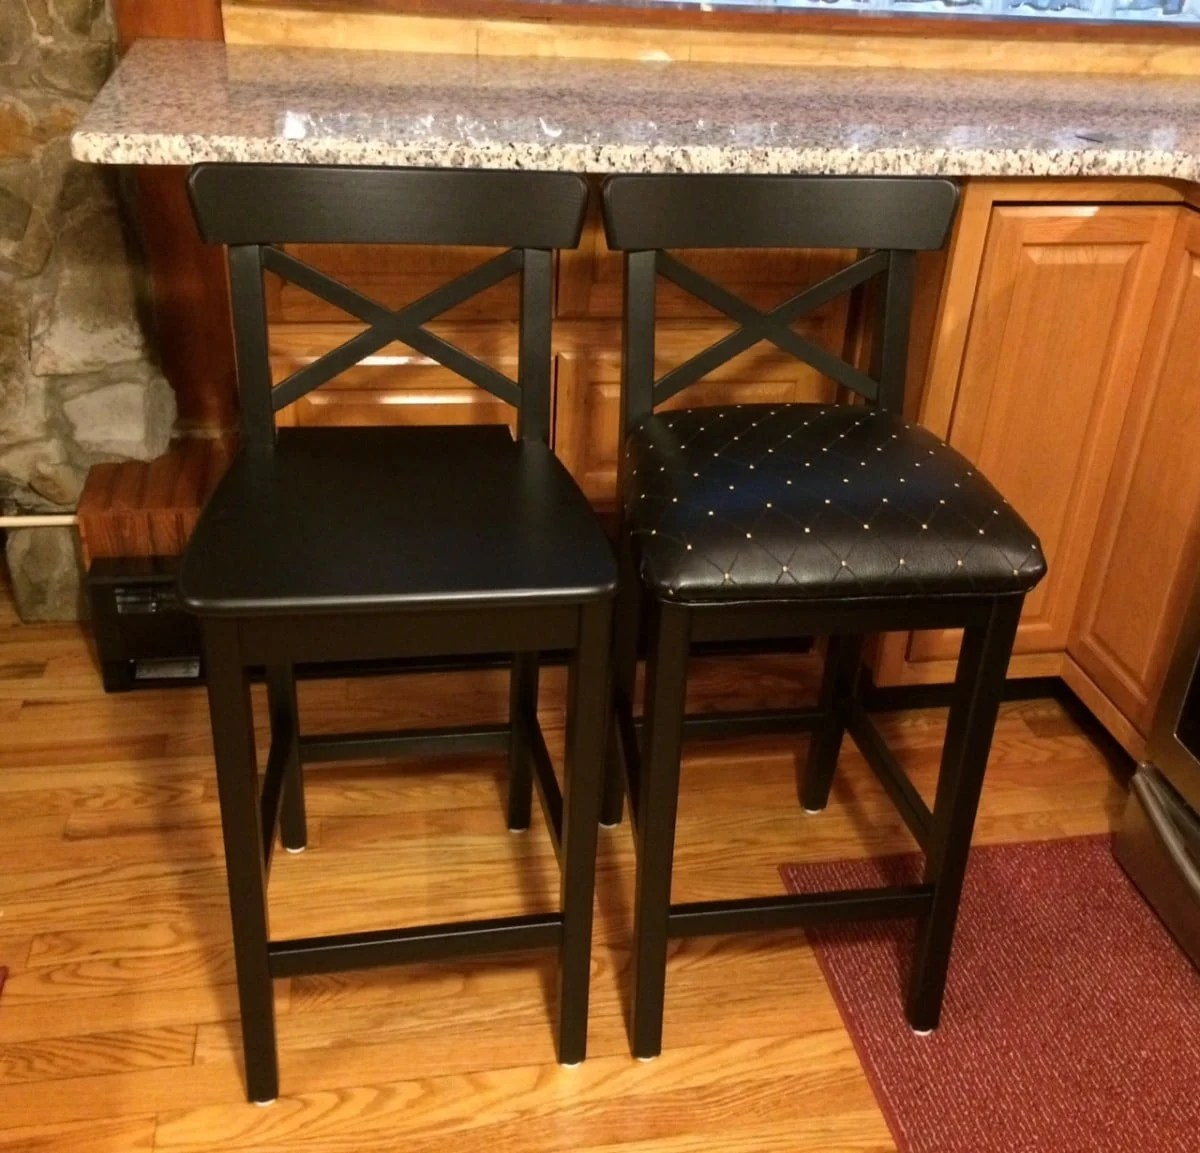 ikea chair cushions shell knock off drab to fab ingolf bar stools - hackers